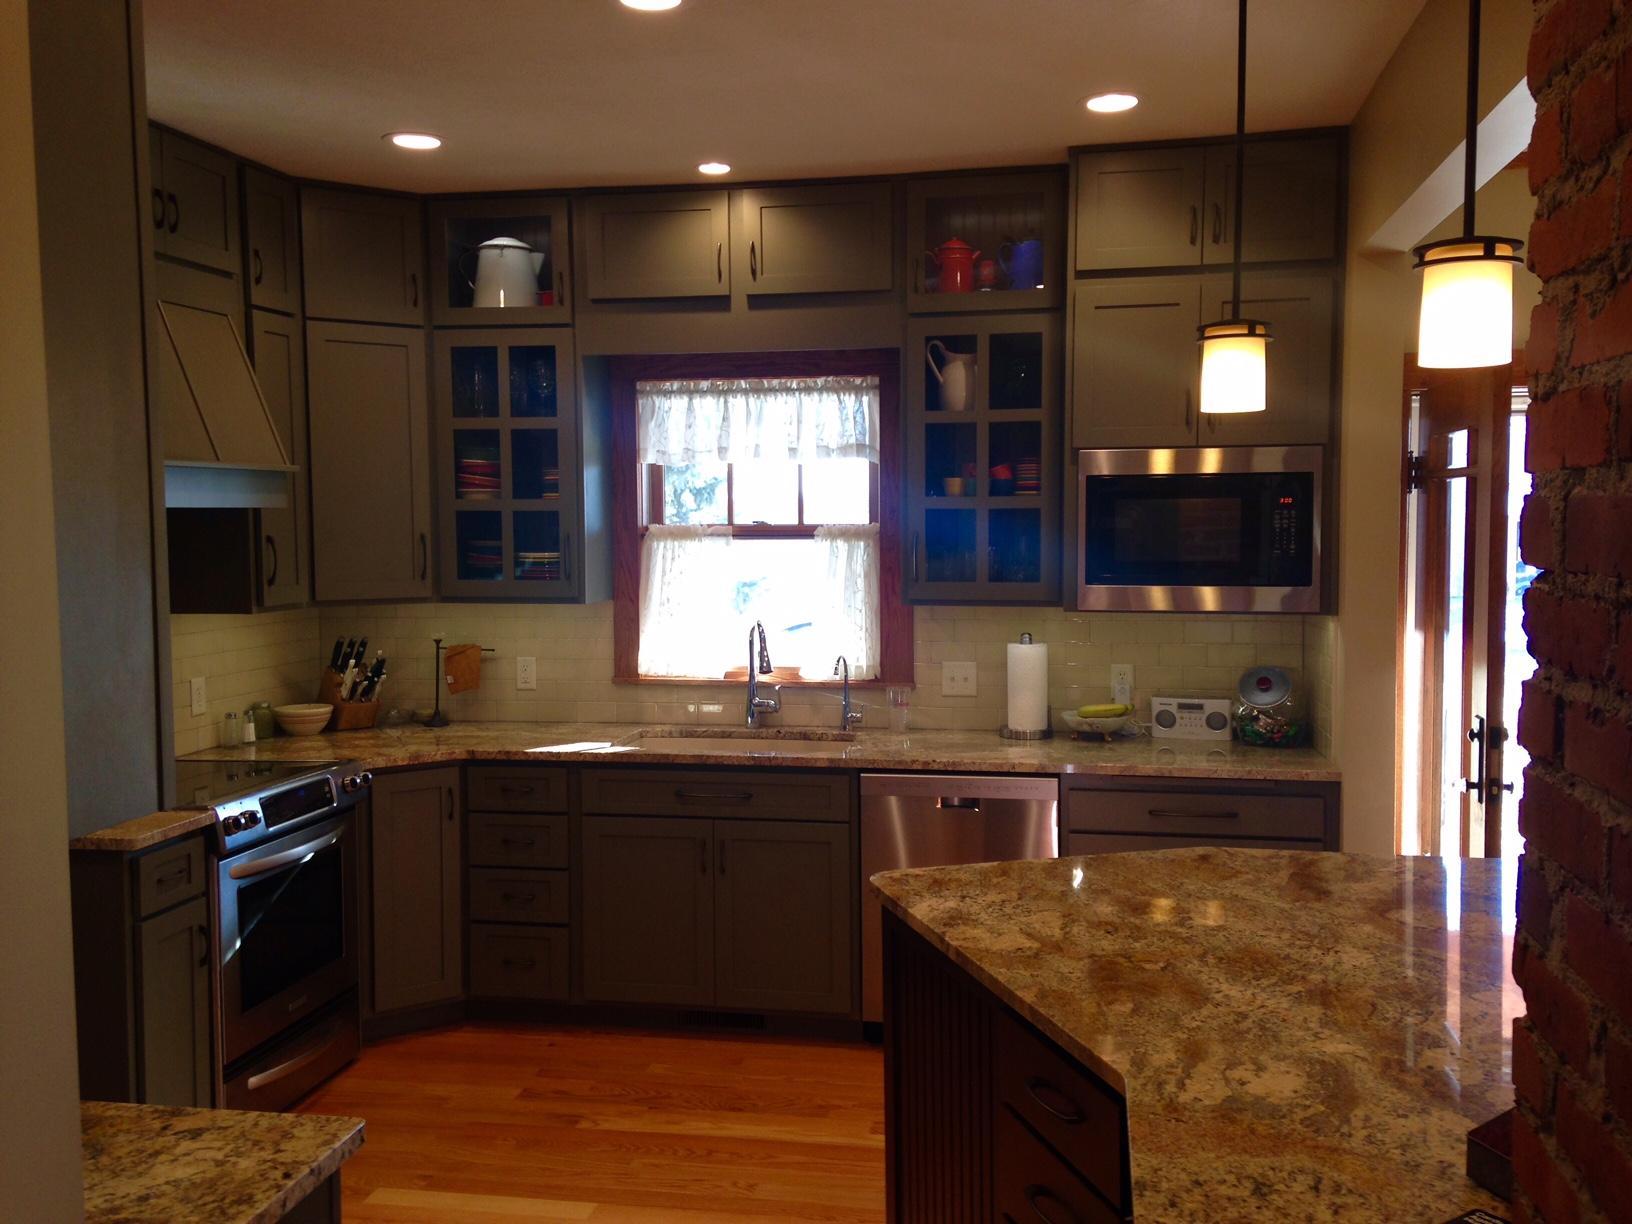 schlake kitchen remodel firth ne kitchen remodeling lincoln ne kitchen photo kitchen photo 2